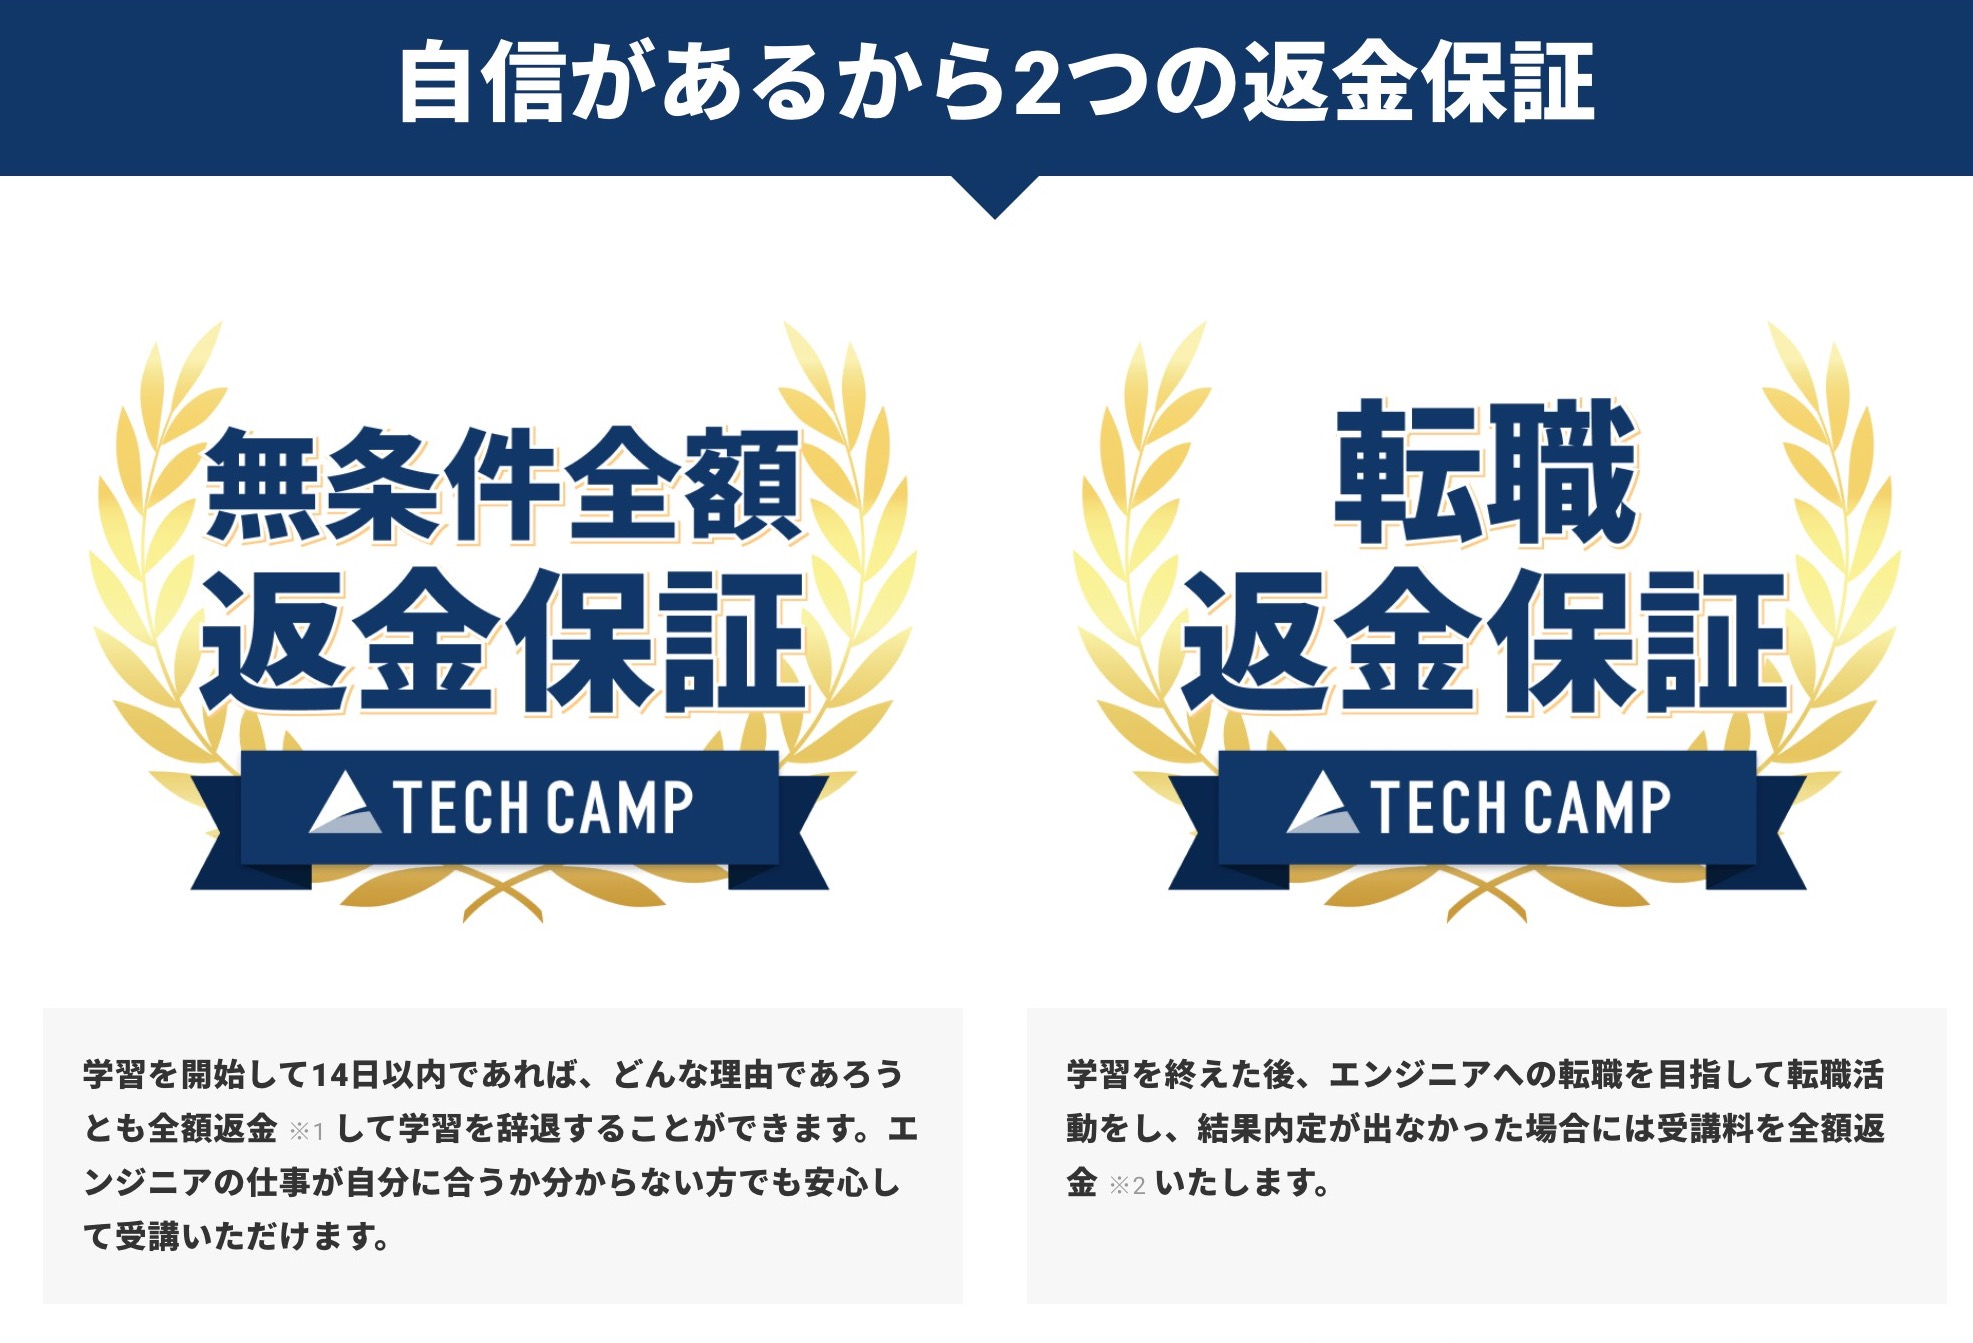 TECH CAMPのダブル保証